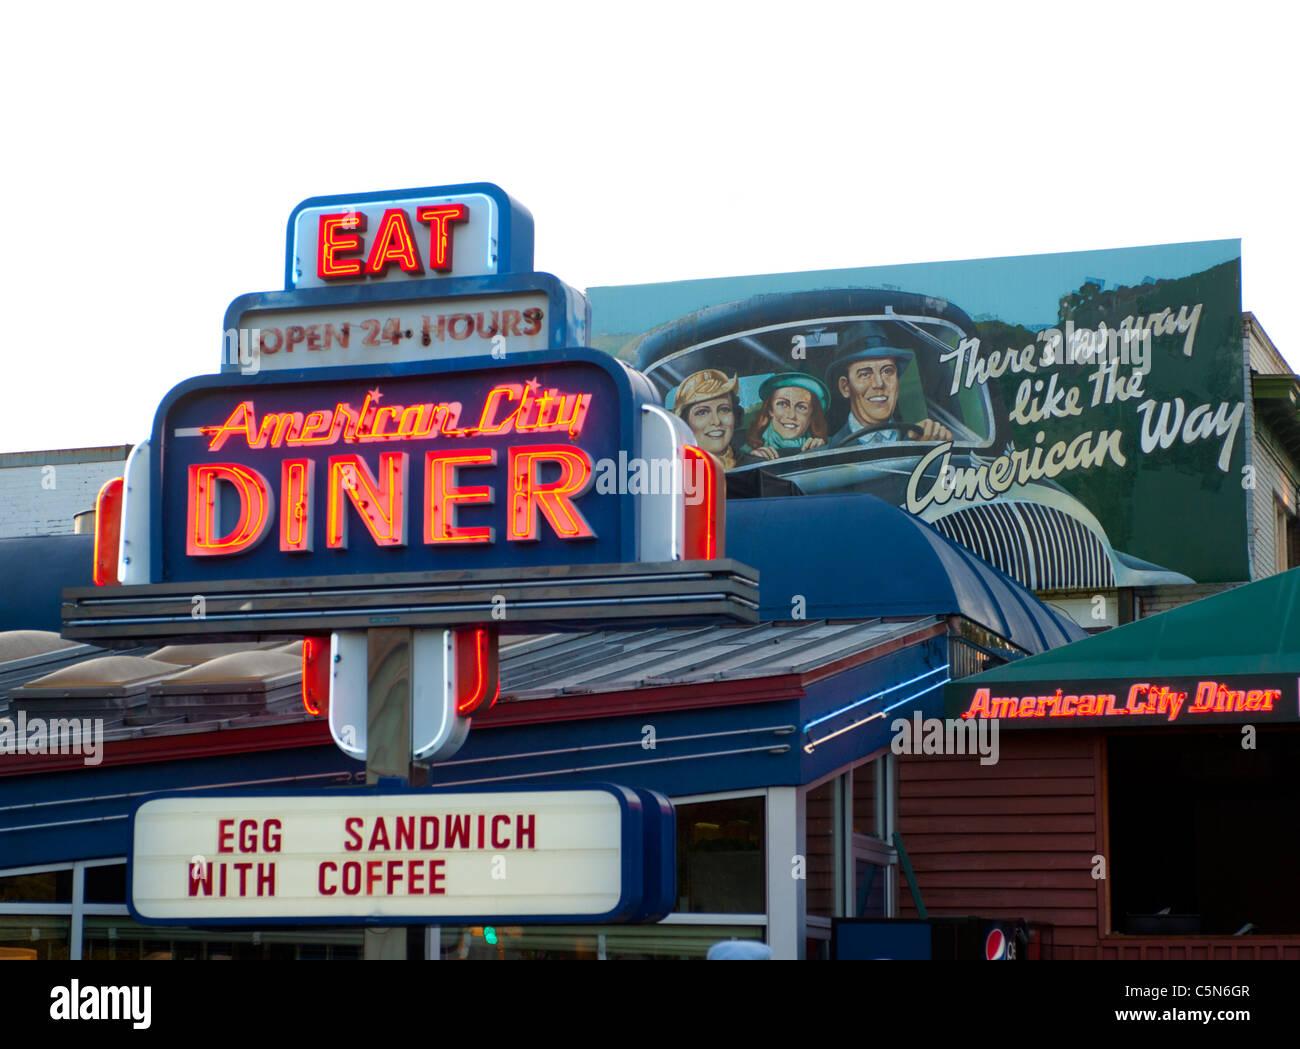 usa-america-americana-american-city-diner-neon-sign-eat-C5N6GR.jpg